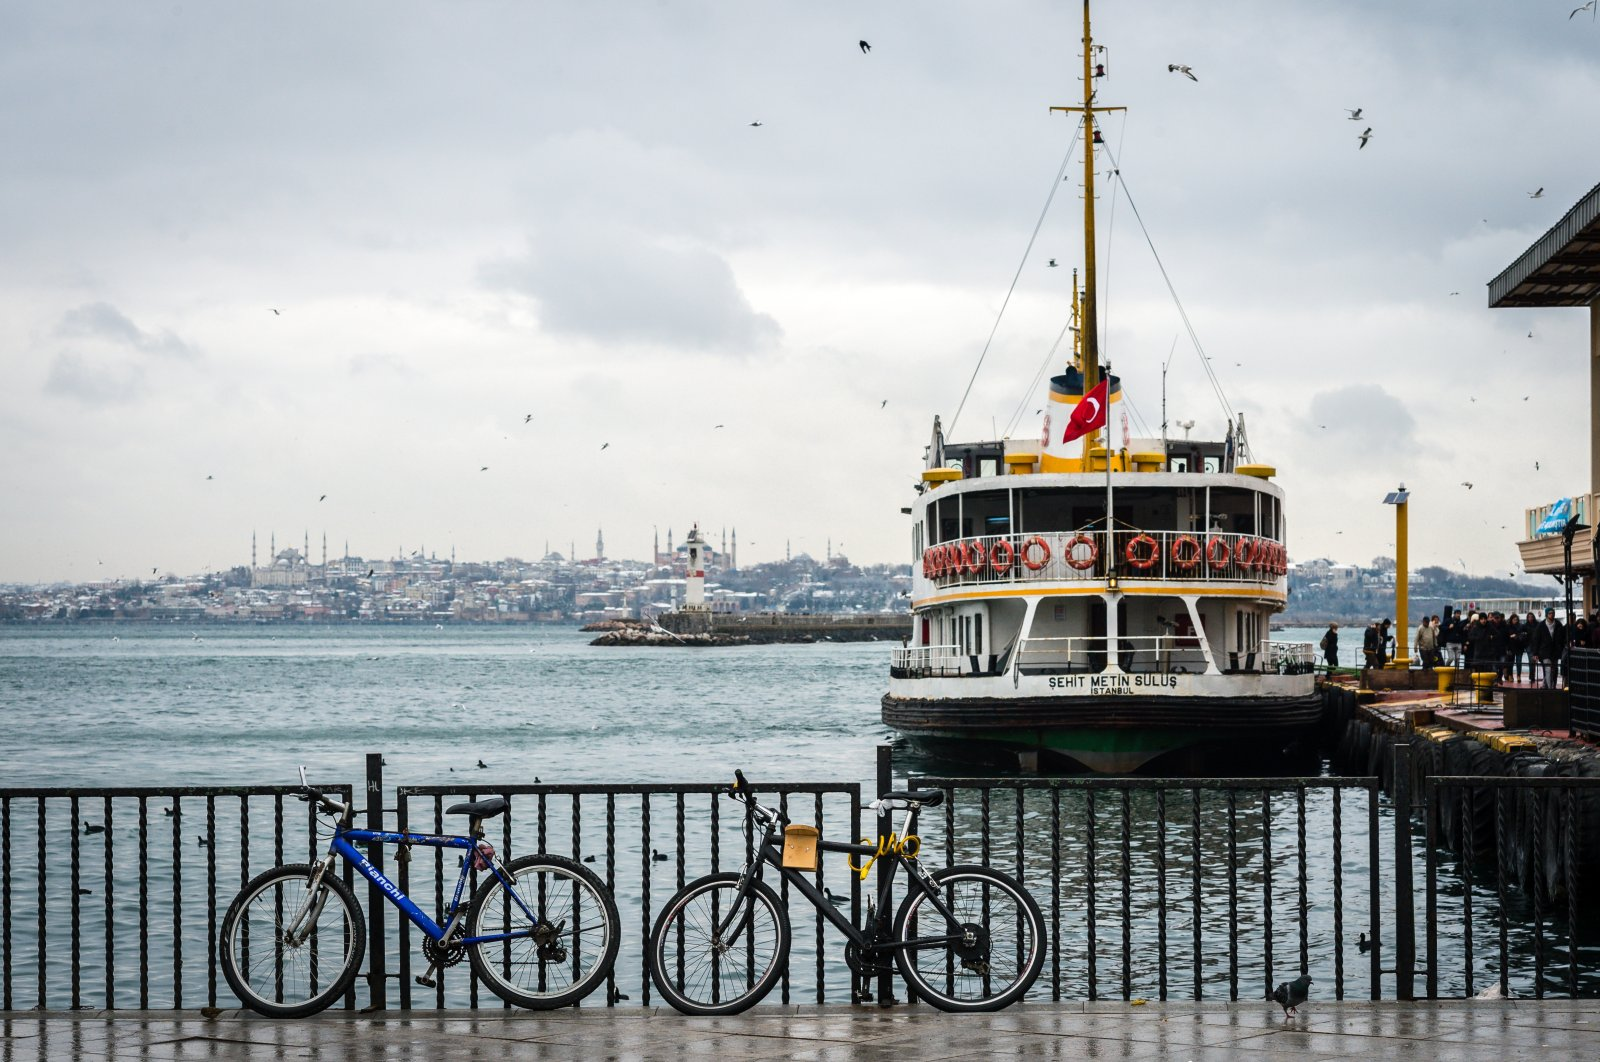 People getting off the ferry at the pier in Kadıköy, Istanbul, Turkey, Jan. 18, 2016. (Shutterstock Photo)